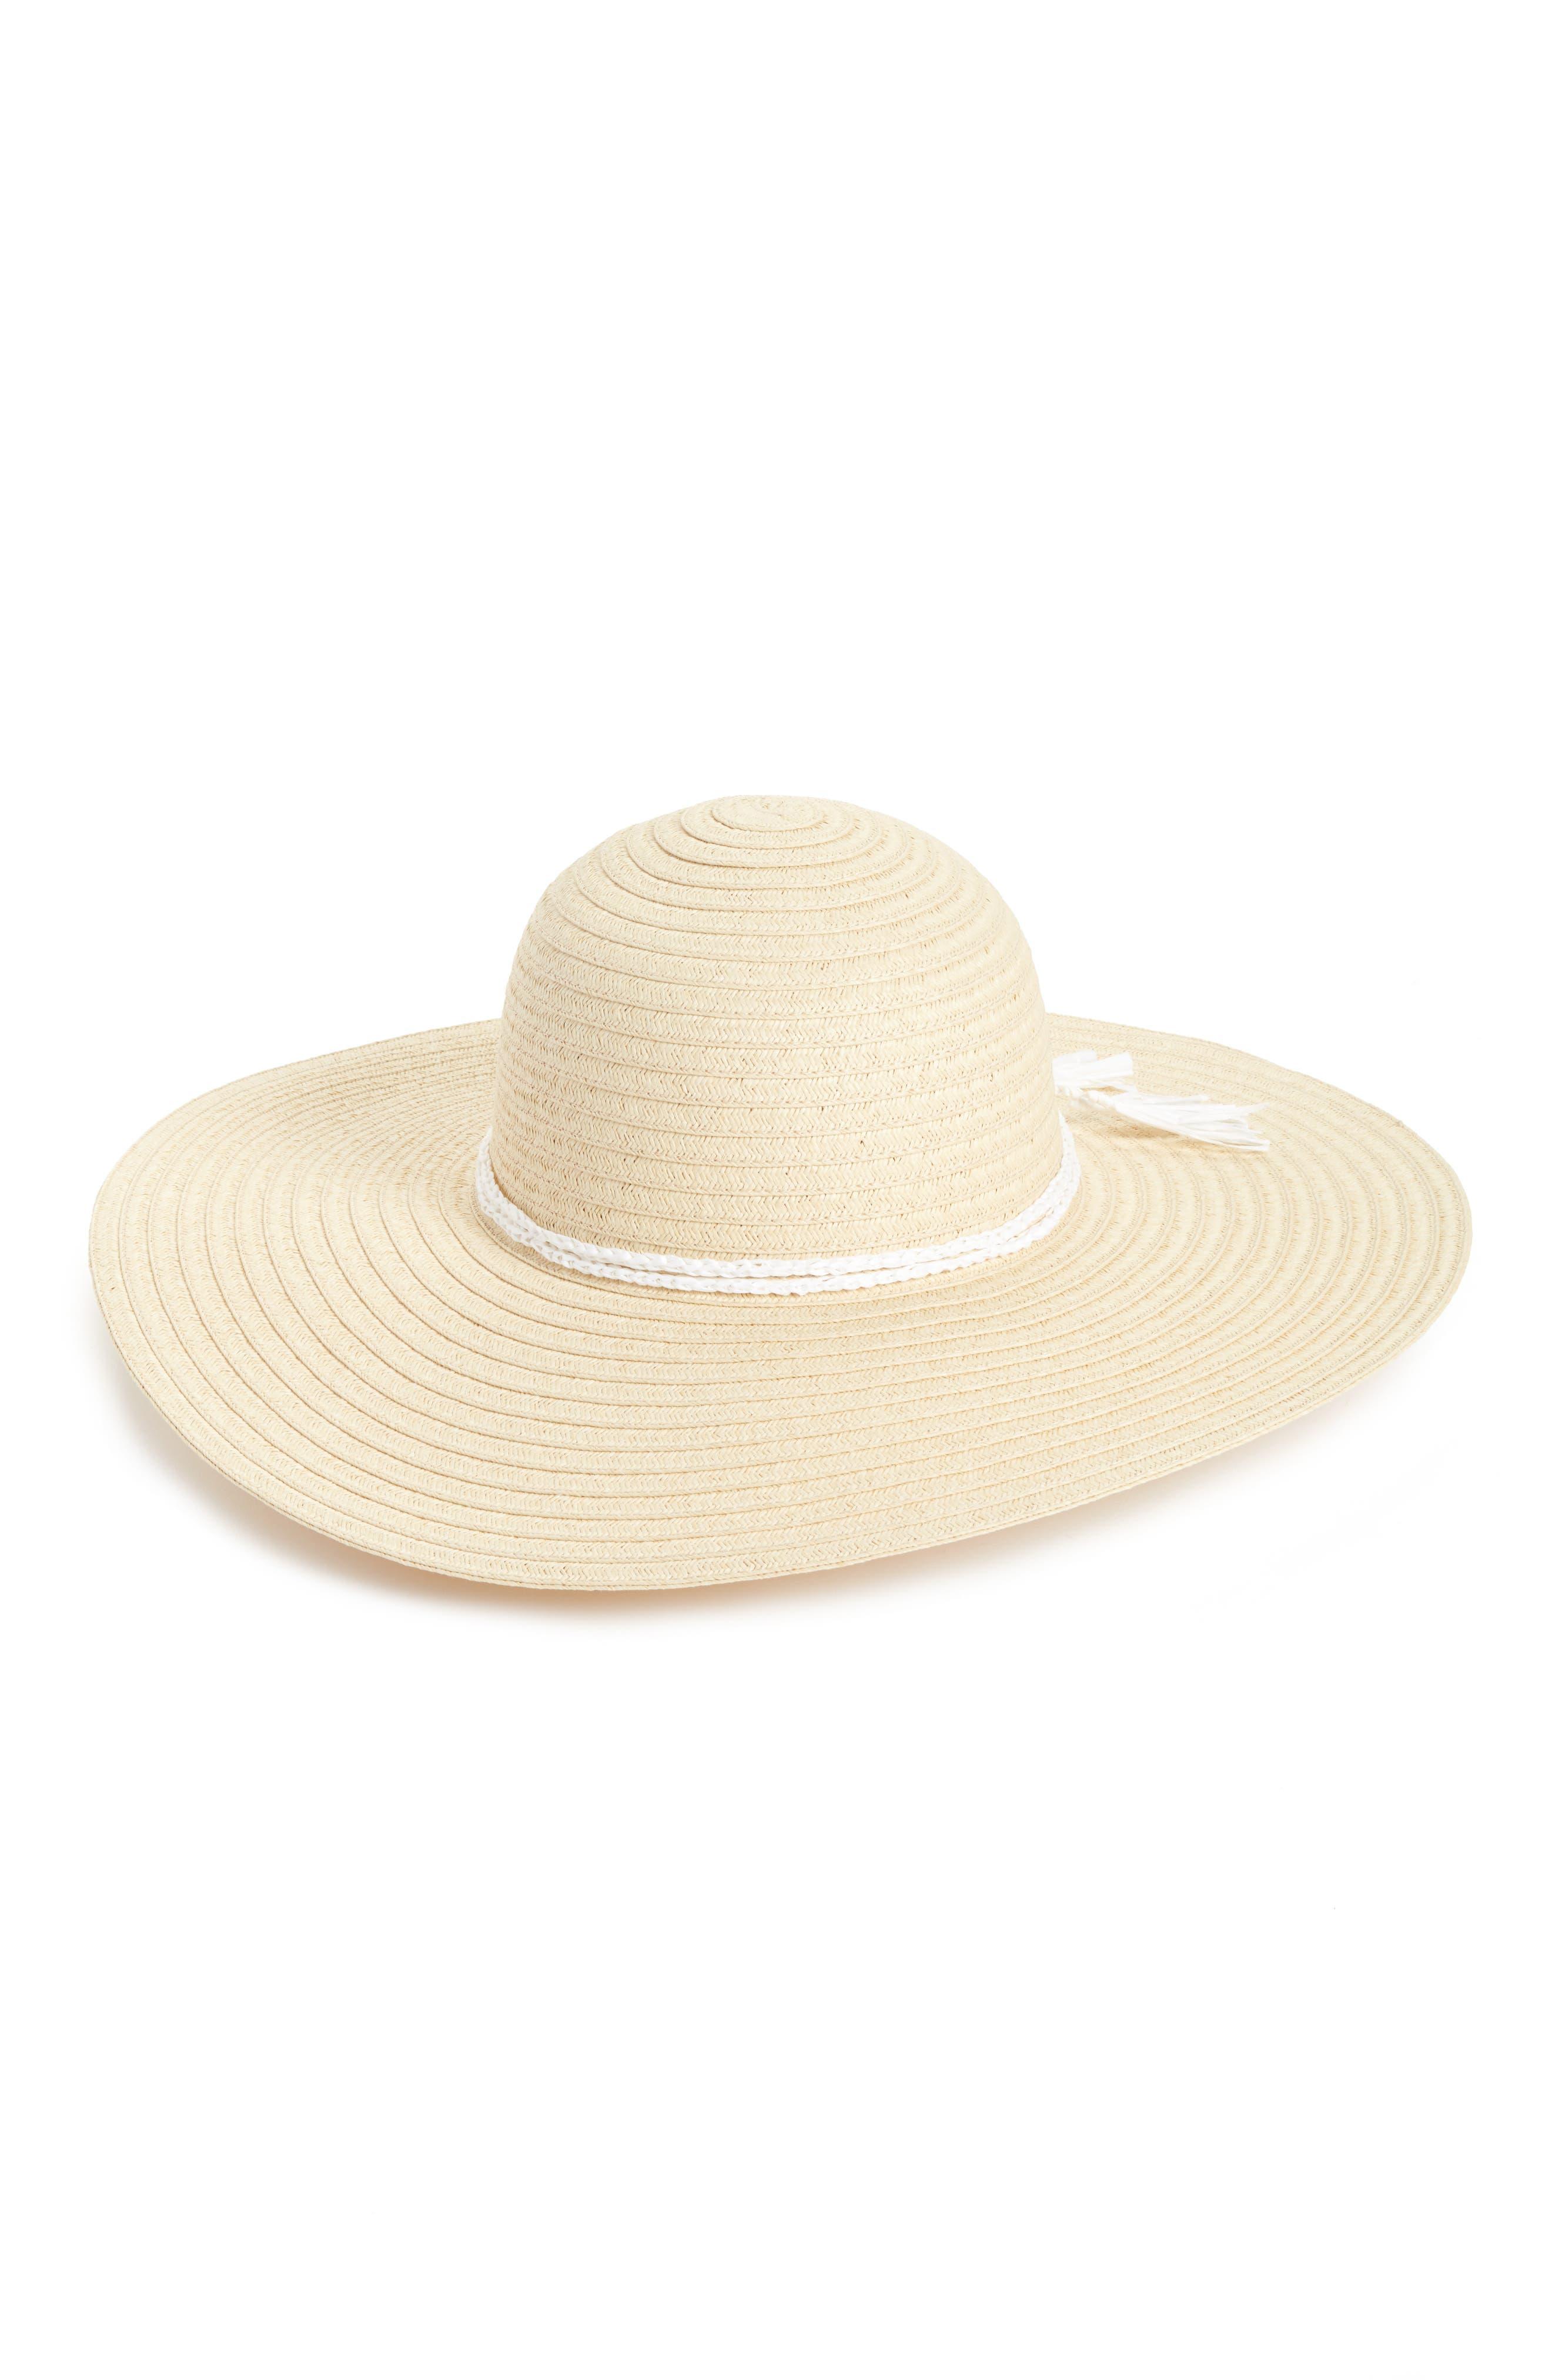 Alternate Image 1 Selected - Caslon® Floppy Hat